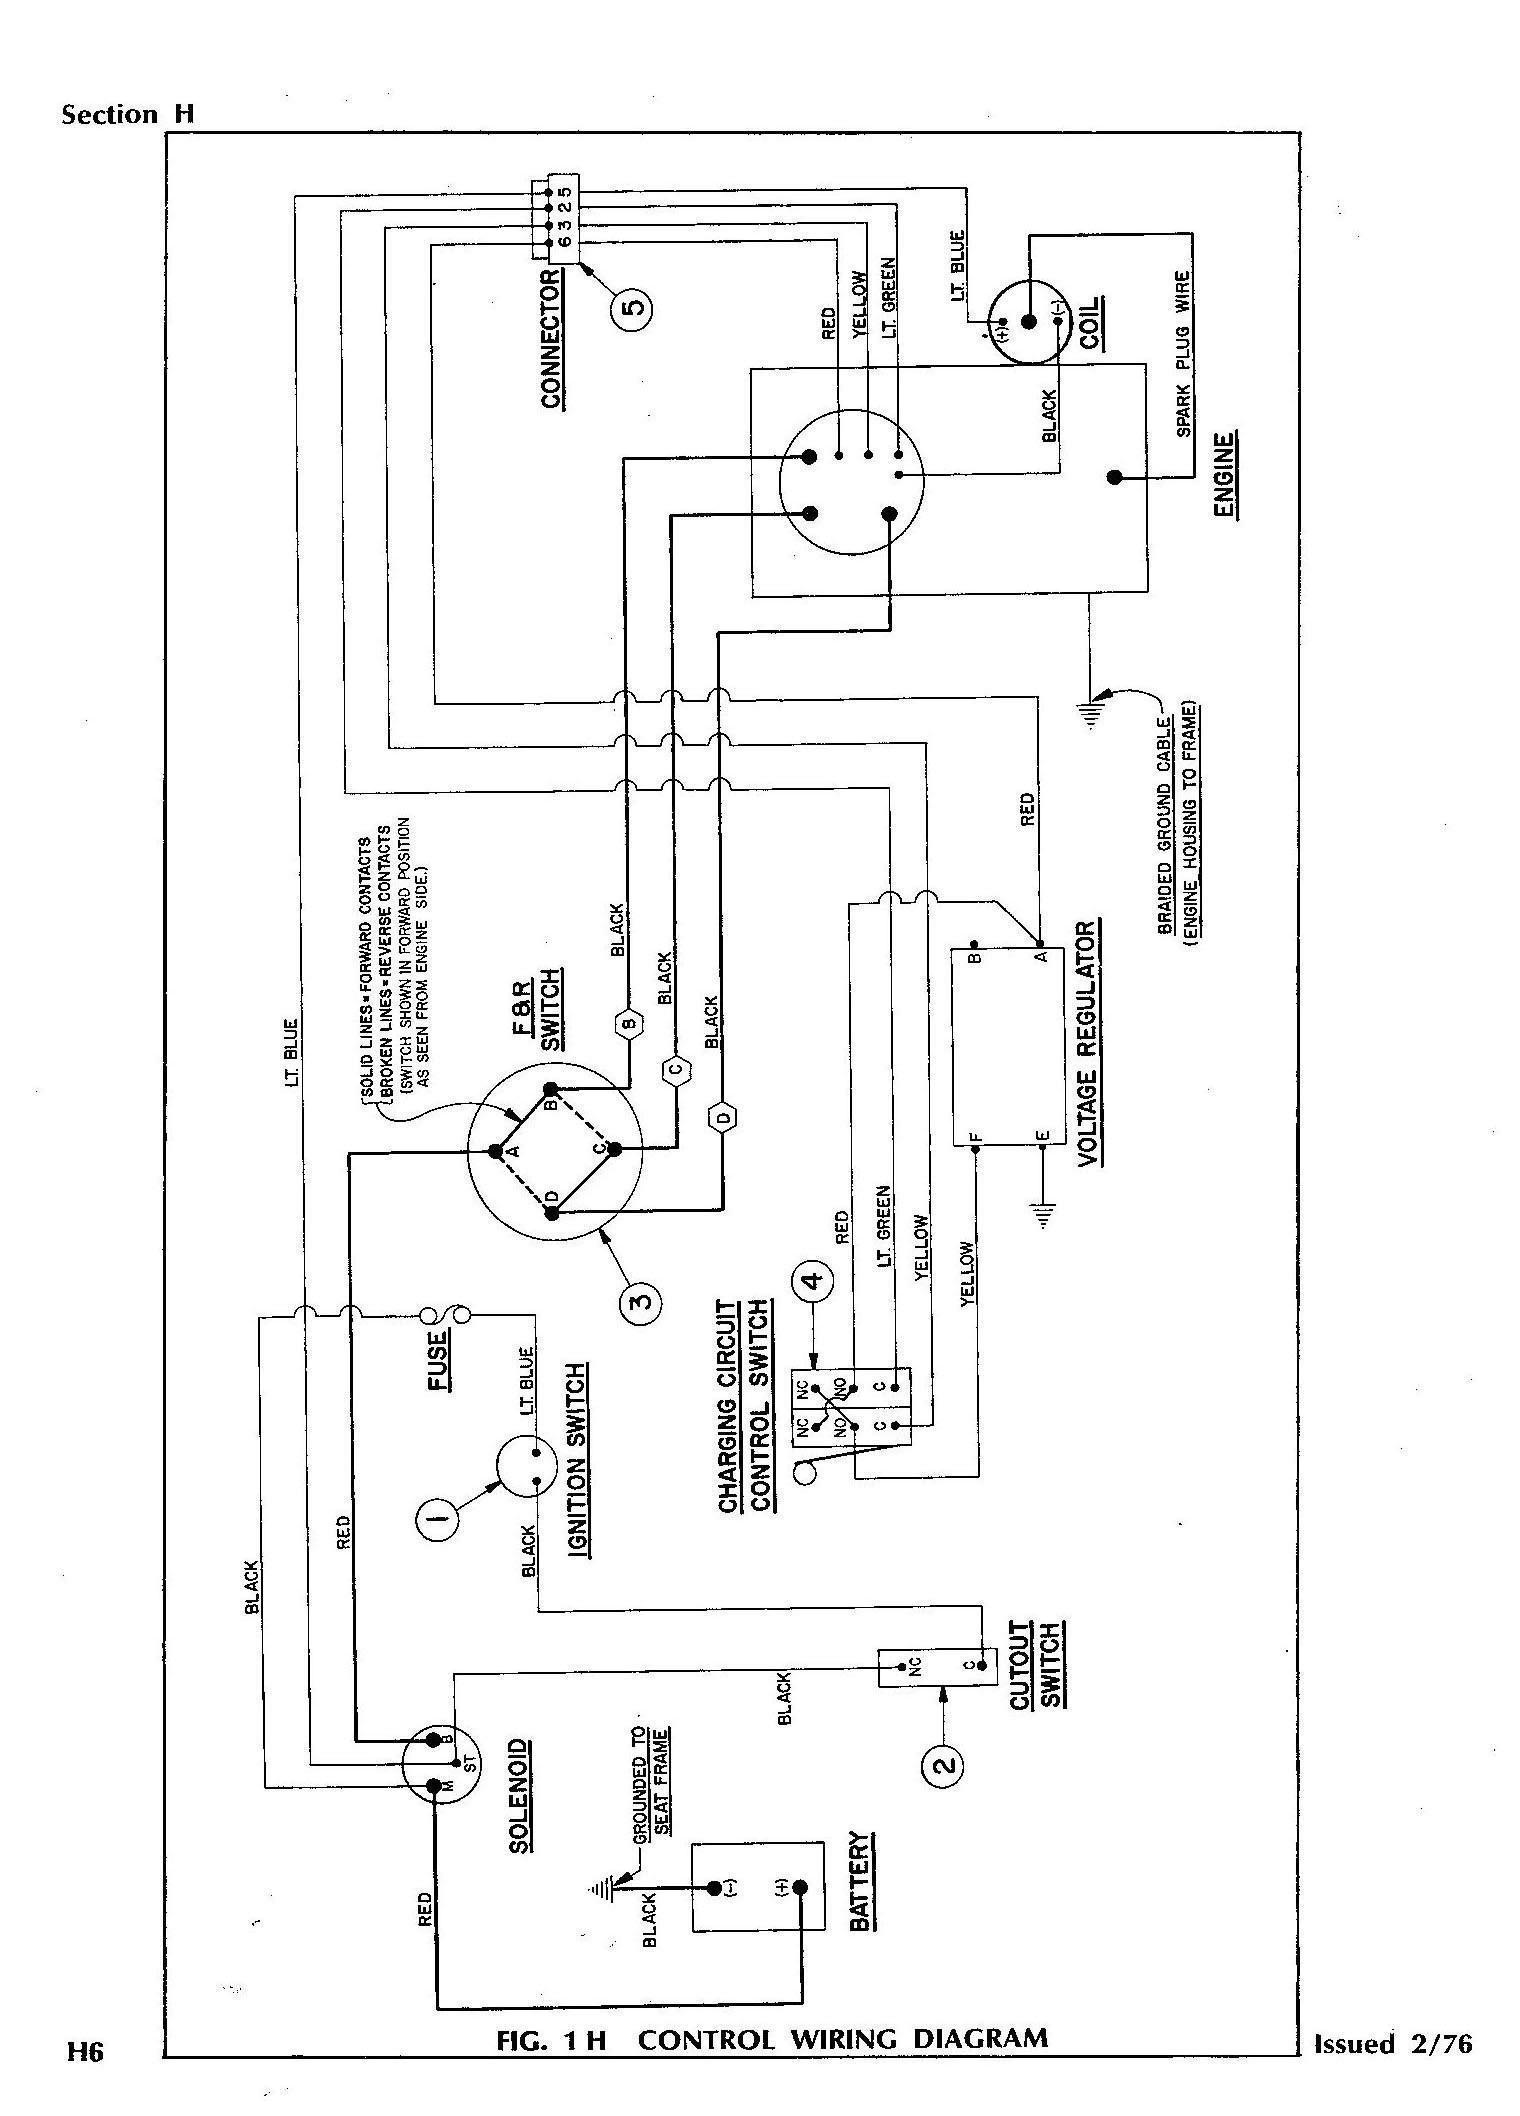 Wiring Diagrams for Yamaha Golf Carts Best Ez Go Gas Golf Cart Wiring Diagram originalstylophone